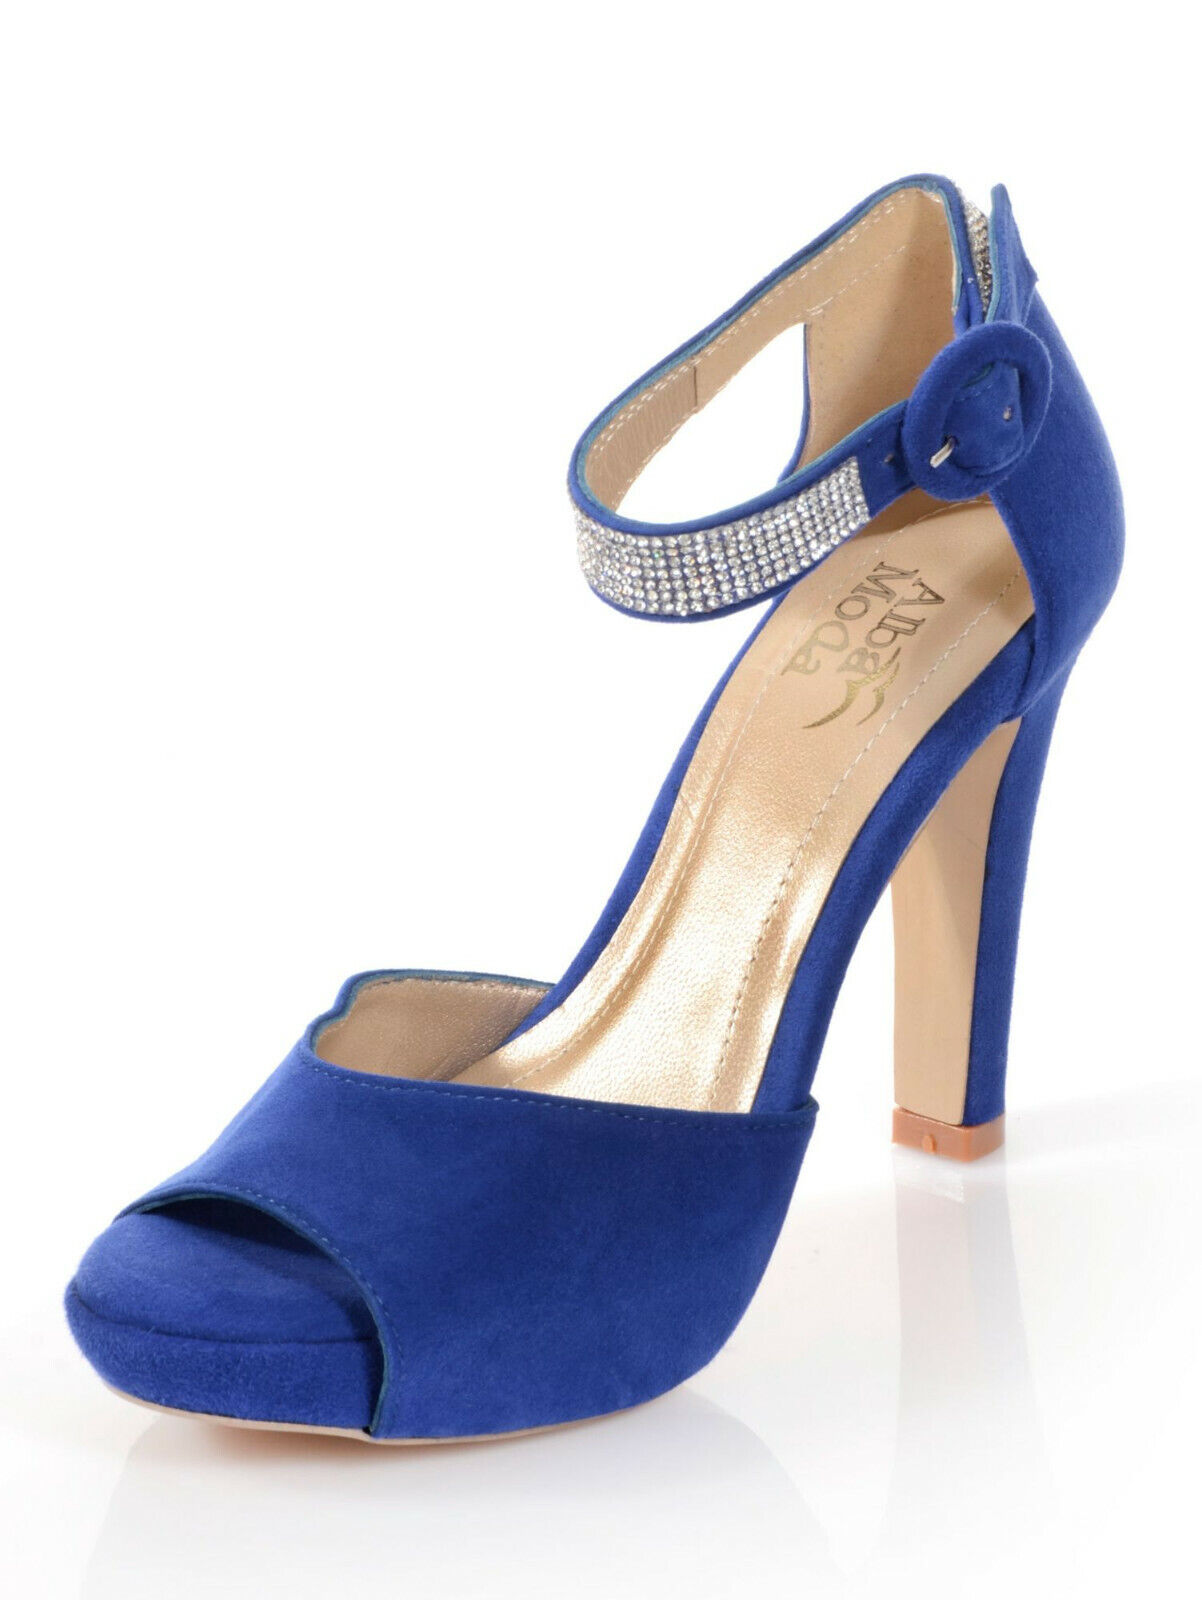 competitive price 56b99 794af Details zu Alba Moda Sandalette mit Plateausohle, royalblau. Gr. 35. NEU!!!  SALE%%%